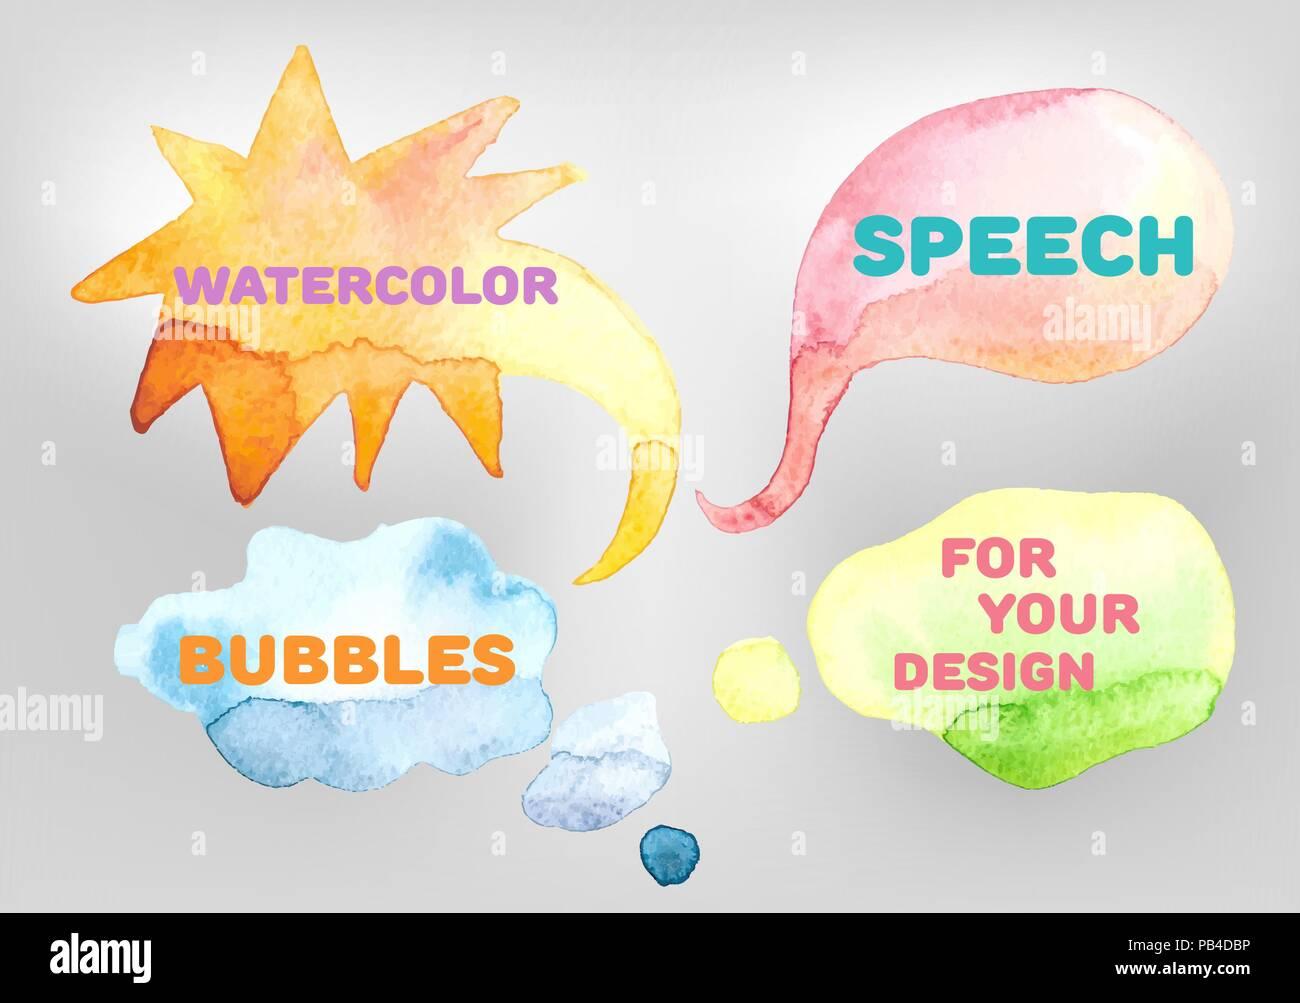 Vector Set Of Watercolor Speech Bubbles - Stock Image